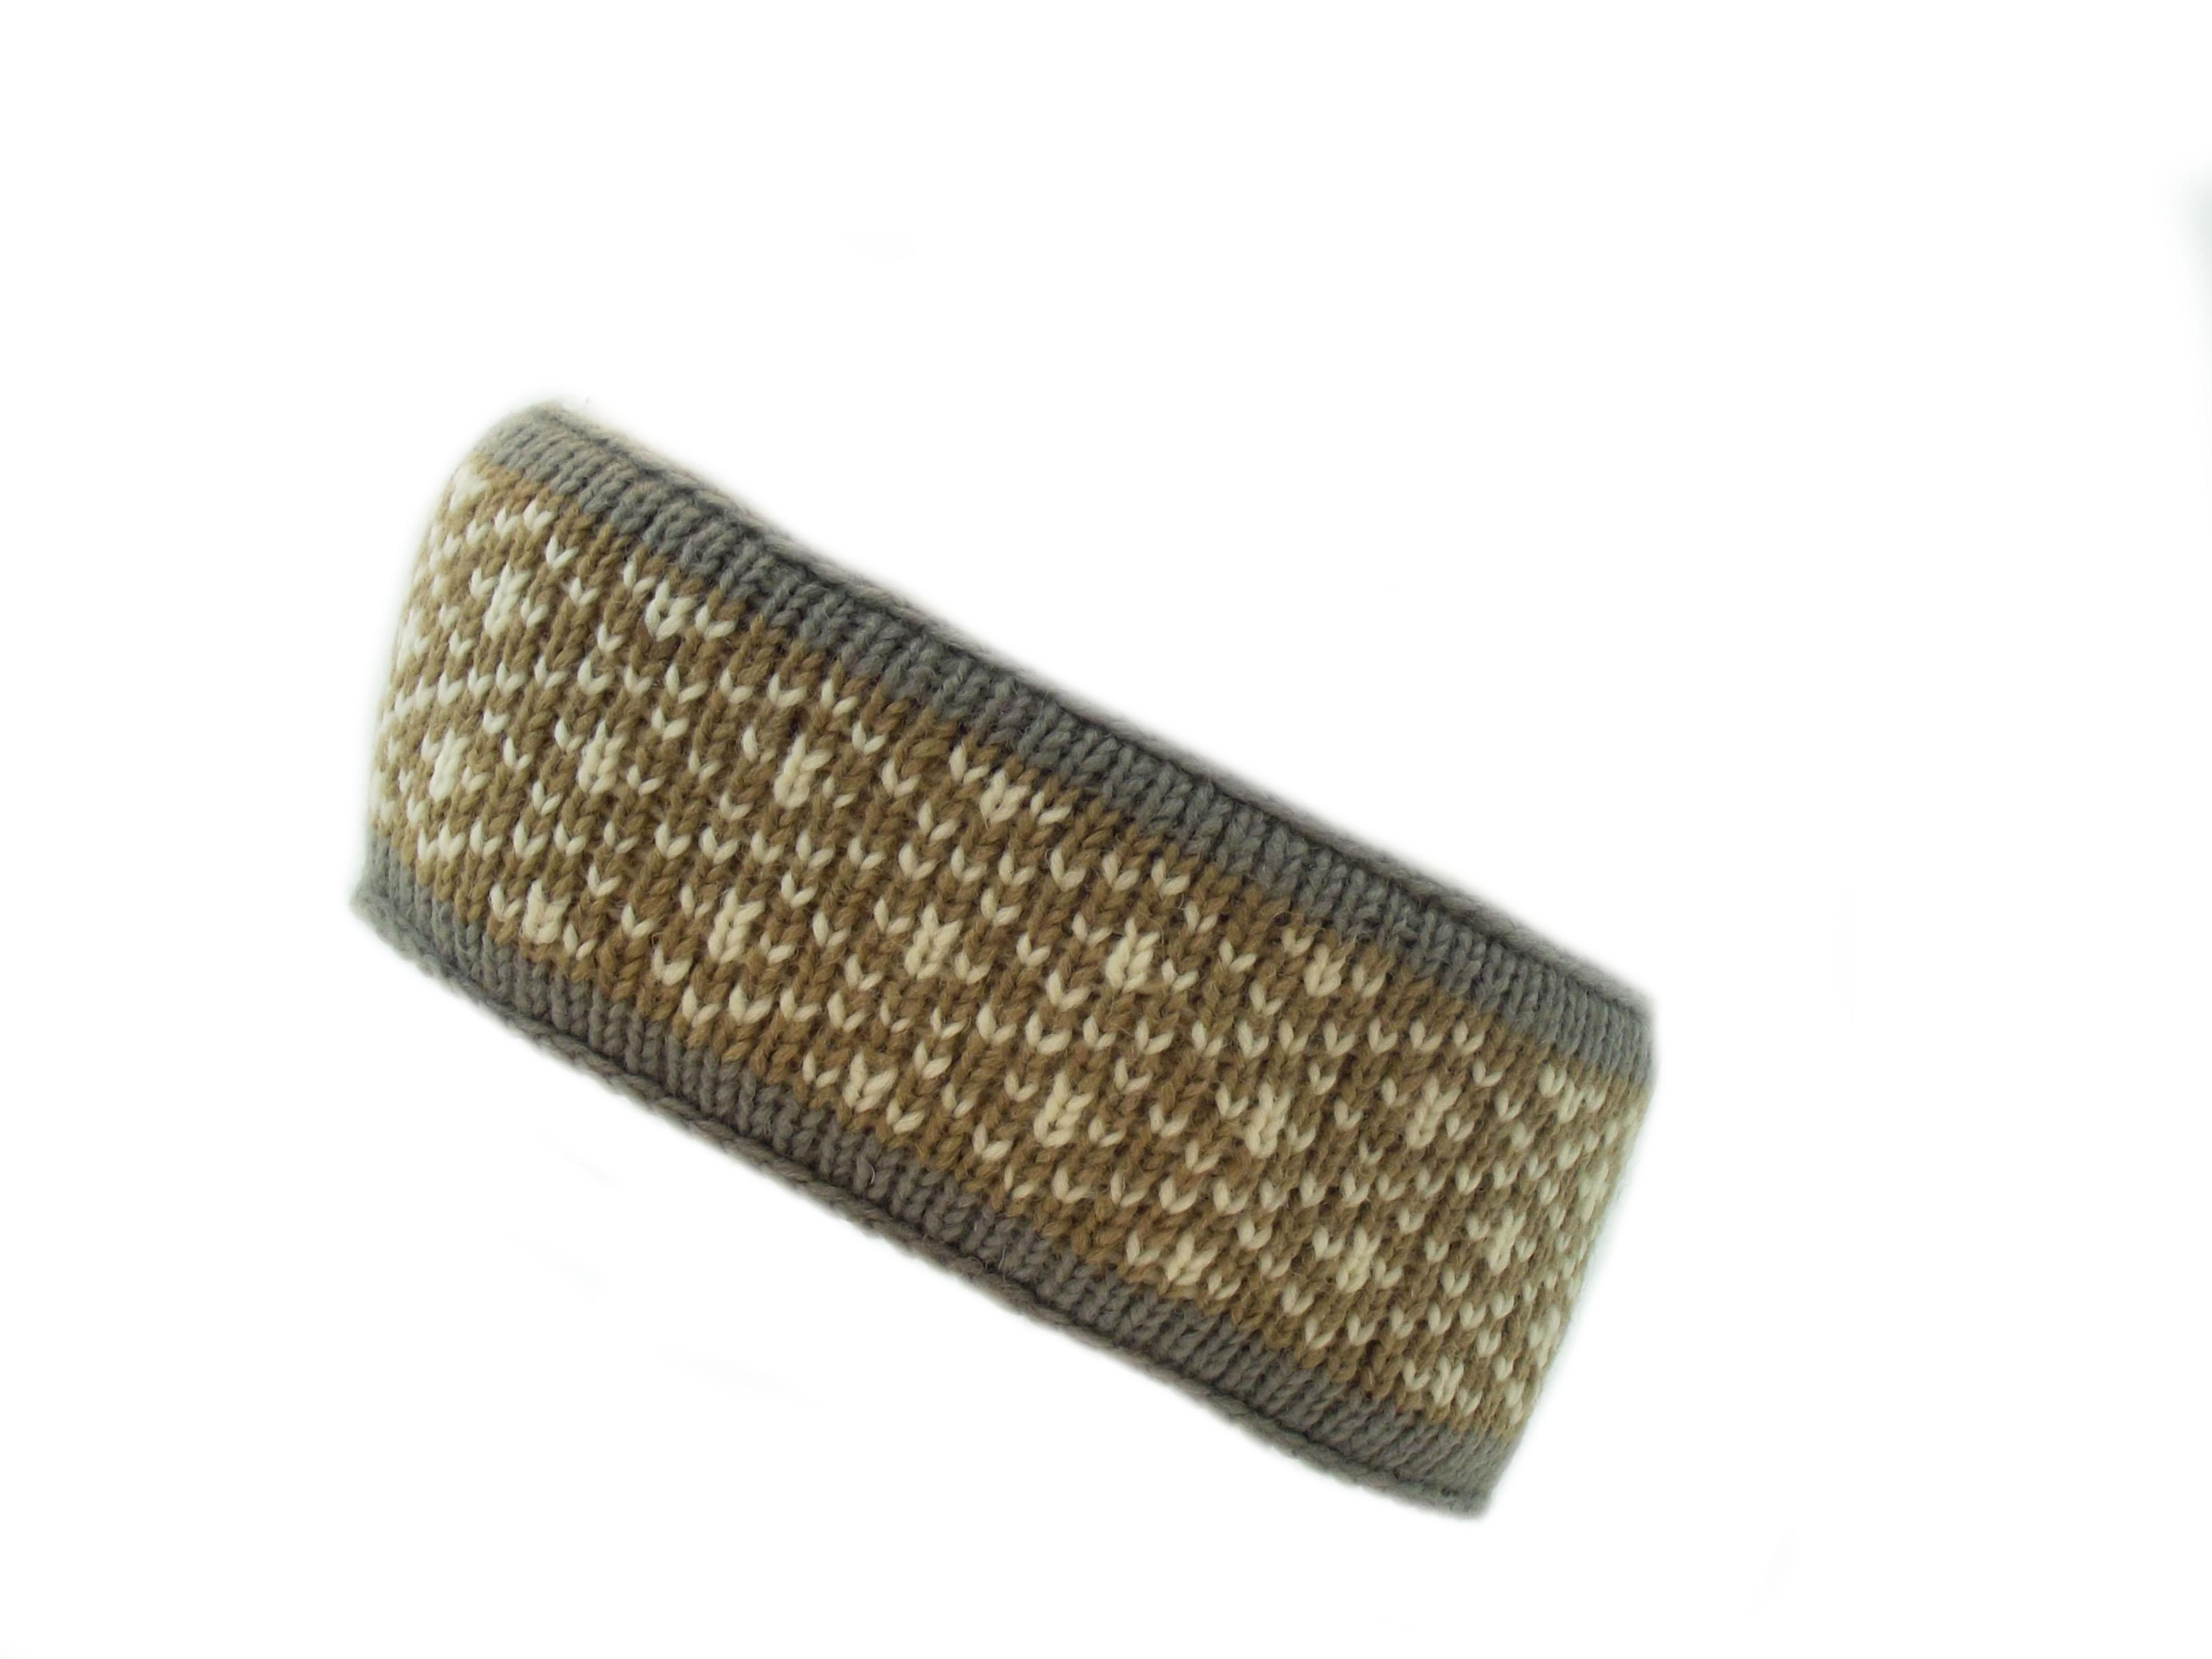 Headband Four Count Wool Beige 100% Wool